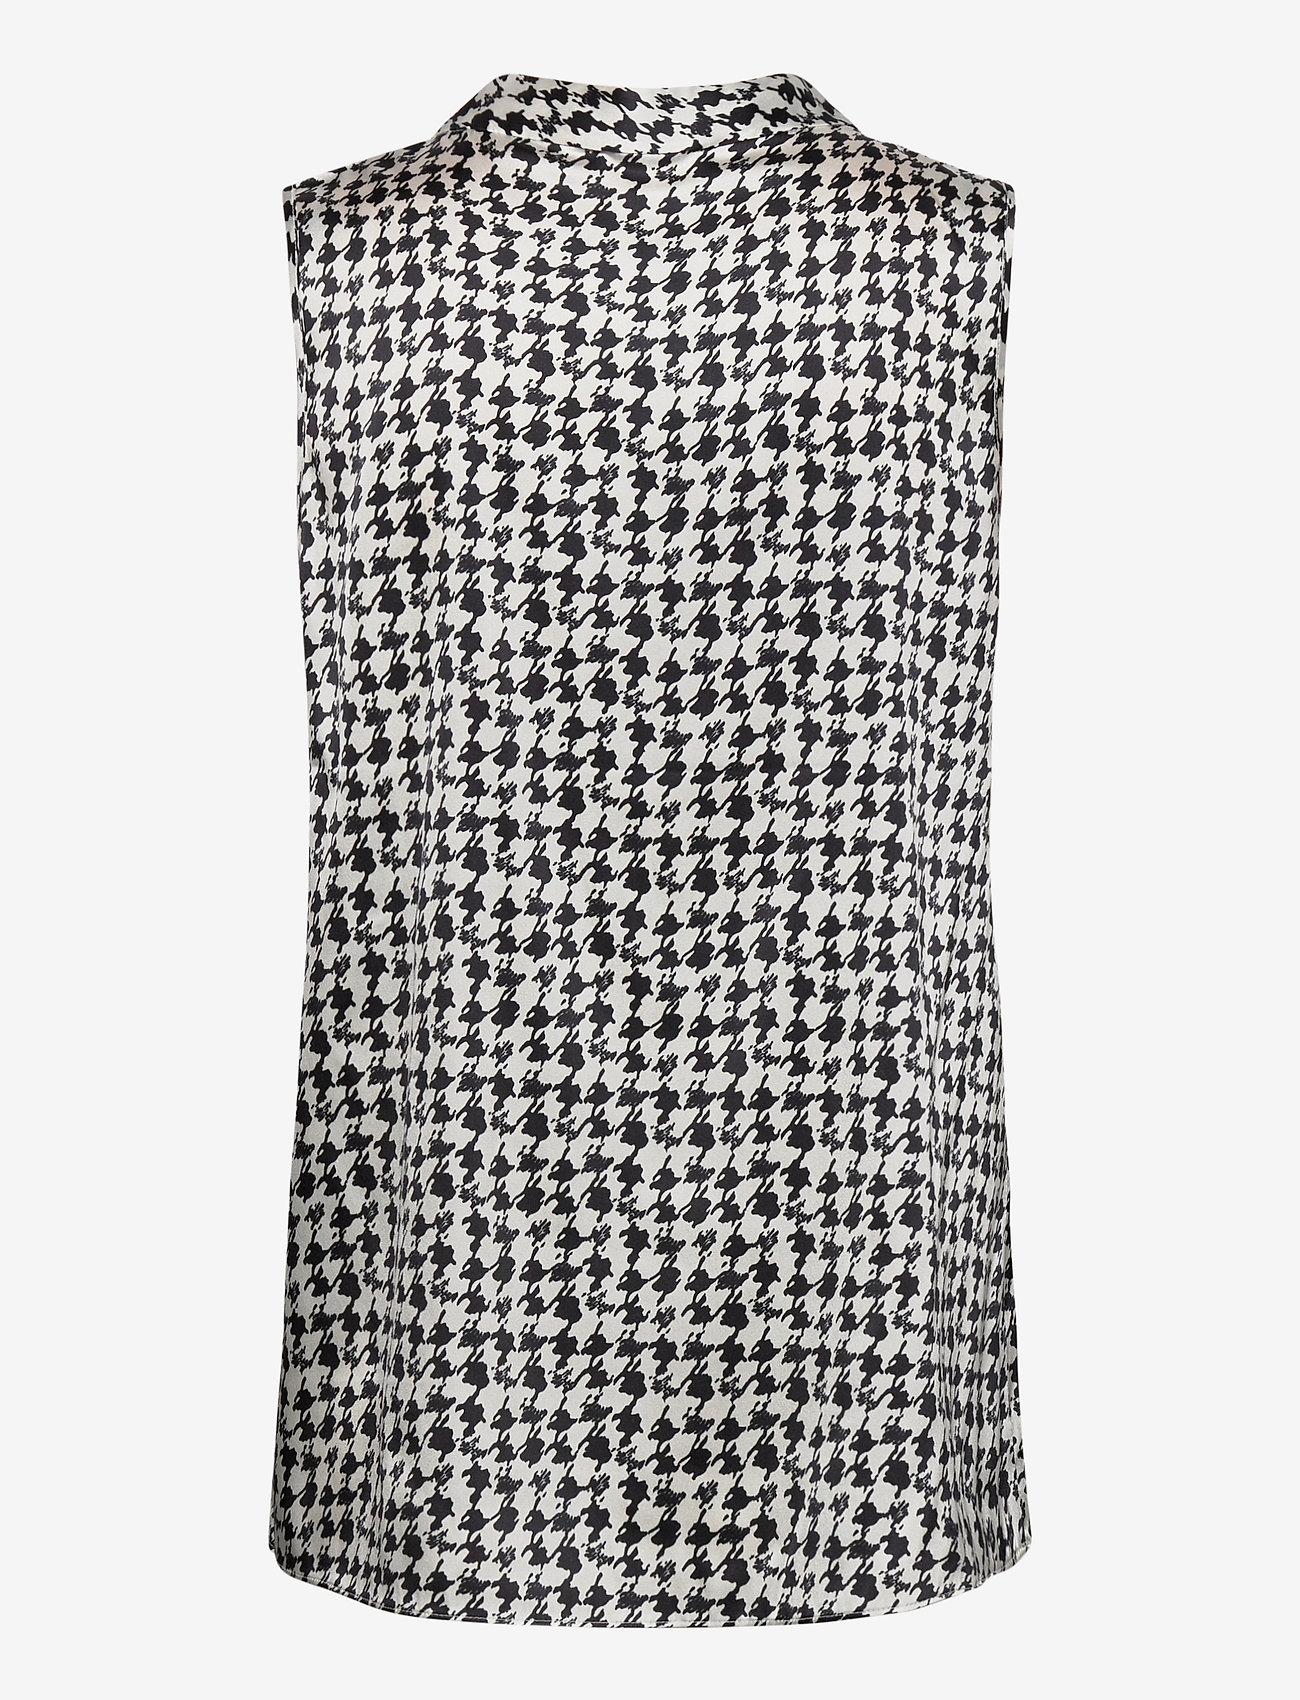 SAND - 3174 Satin - Prosi Top - blouses sans manches - pattern - 1